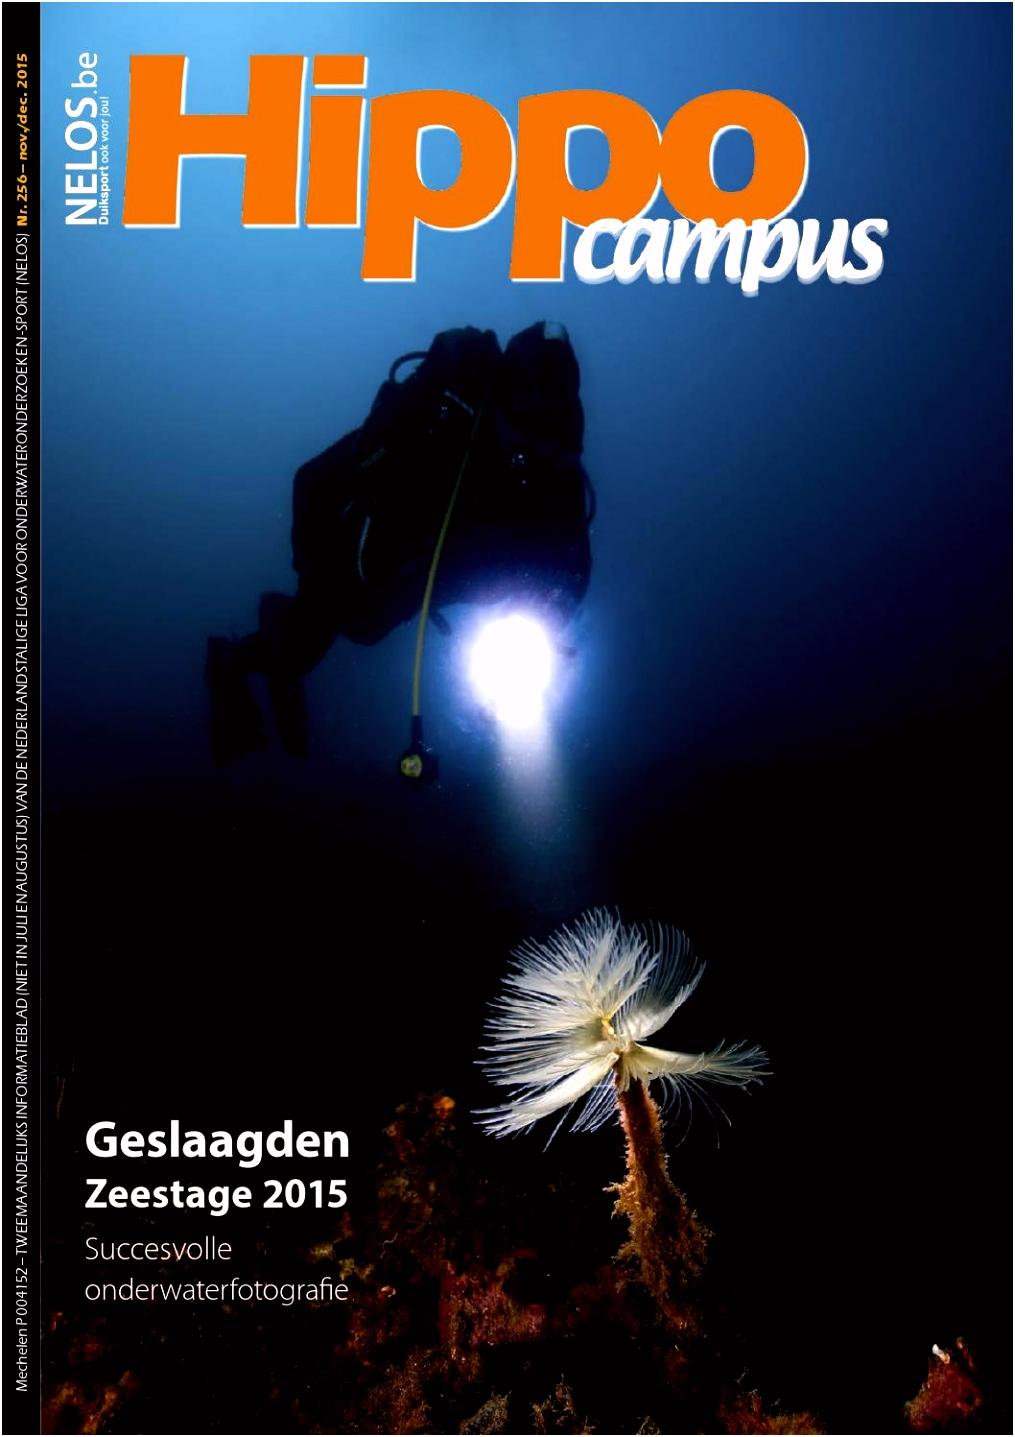 Hippocampus 255 nov dec 2015 by Ivo Madder issuu